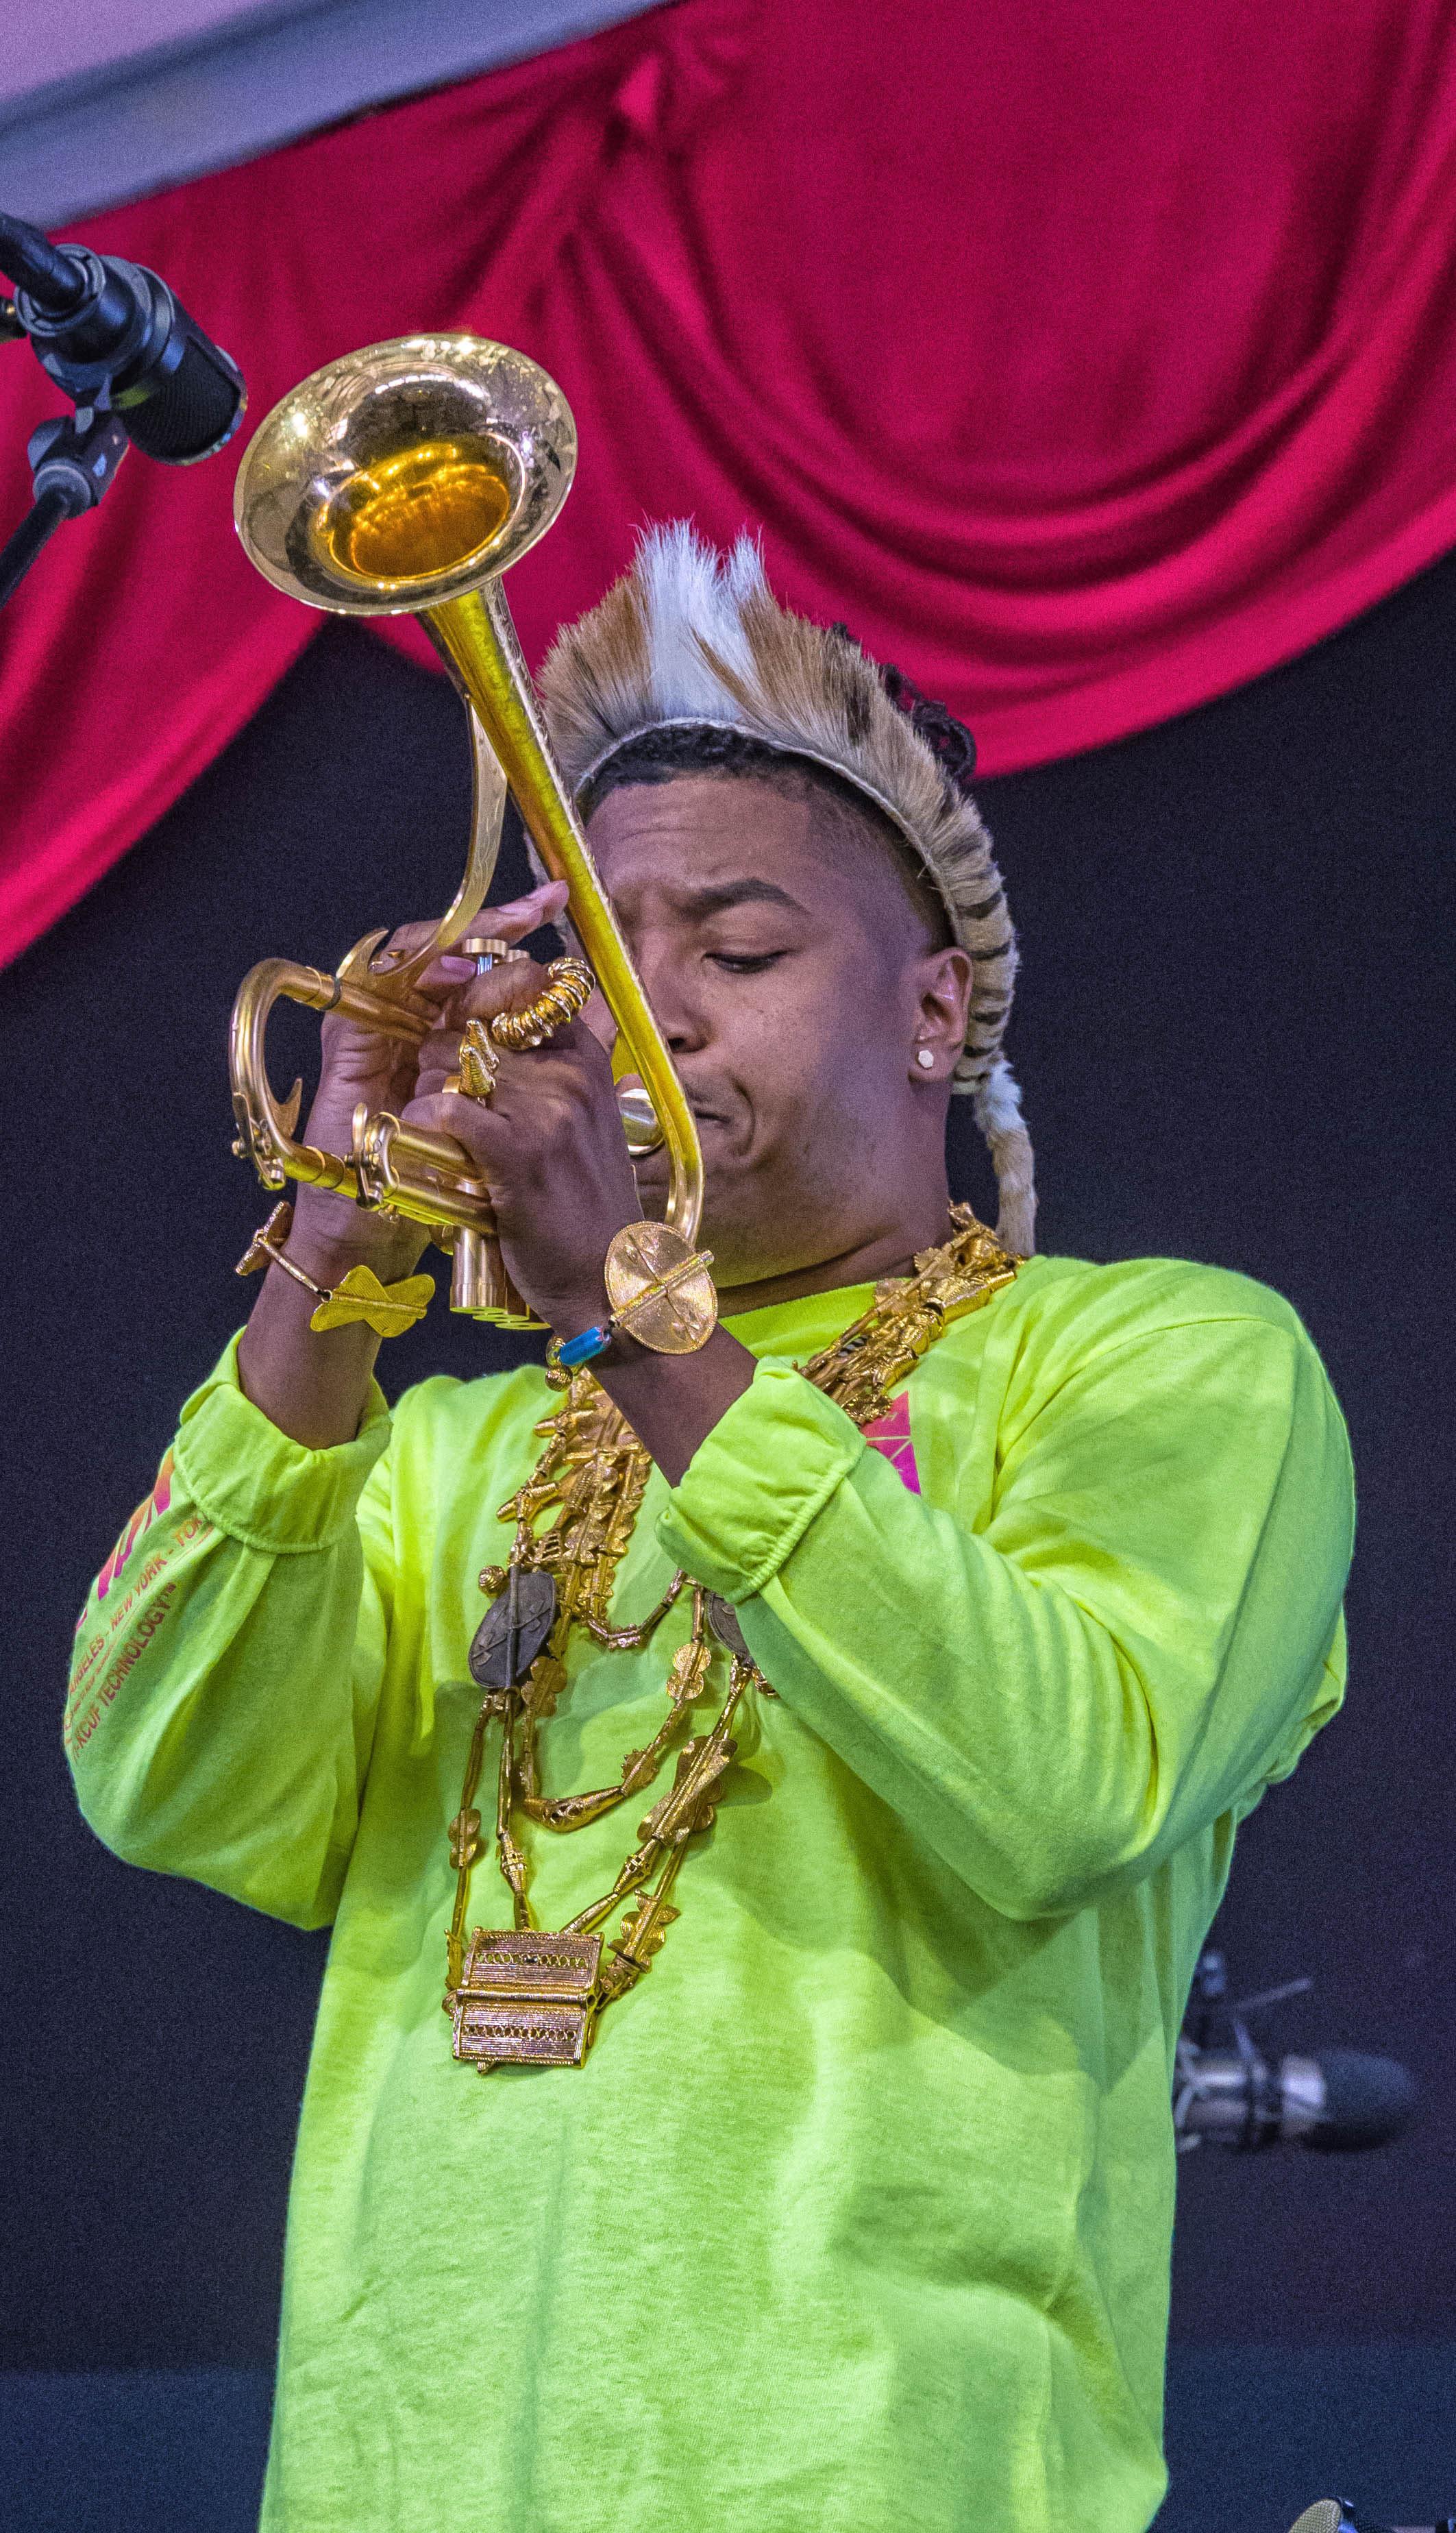 Christian Scott Atunde Adjuah